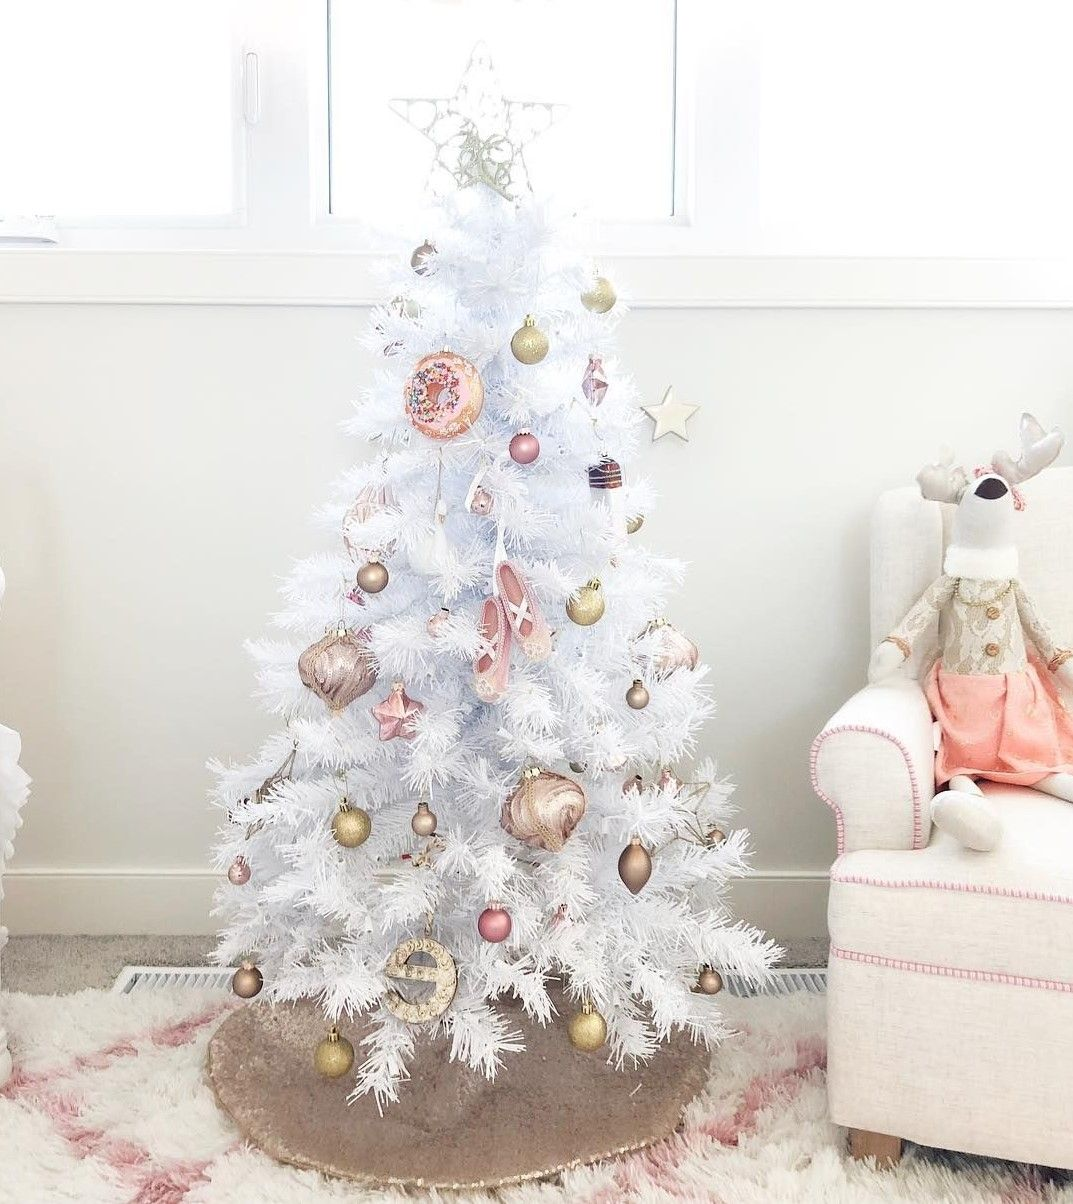 100 Options Incroyables De Deco De Noel Gifi A Bas Prix Decoration Noel Deco Noel Decoration Creative